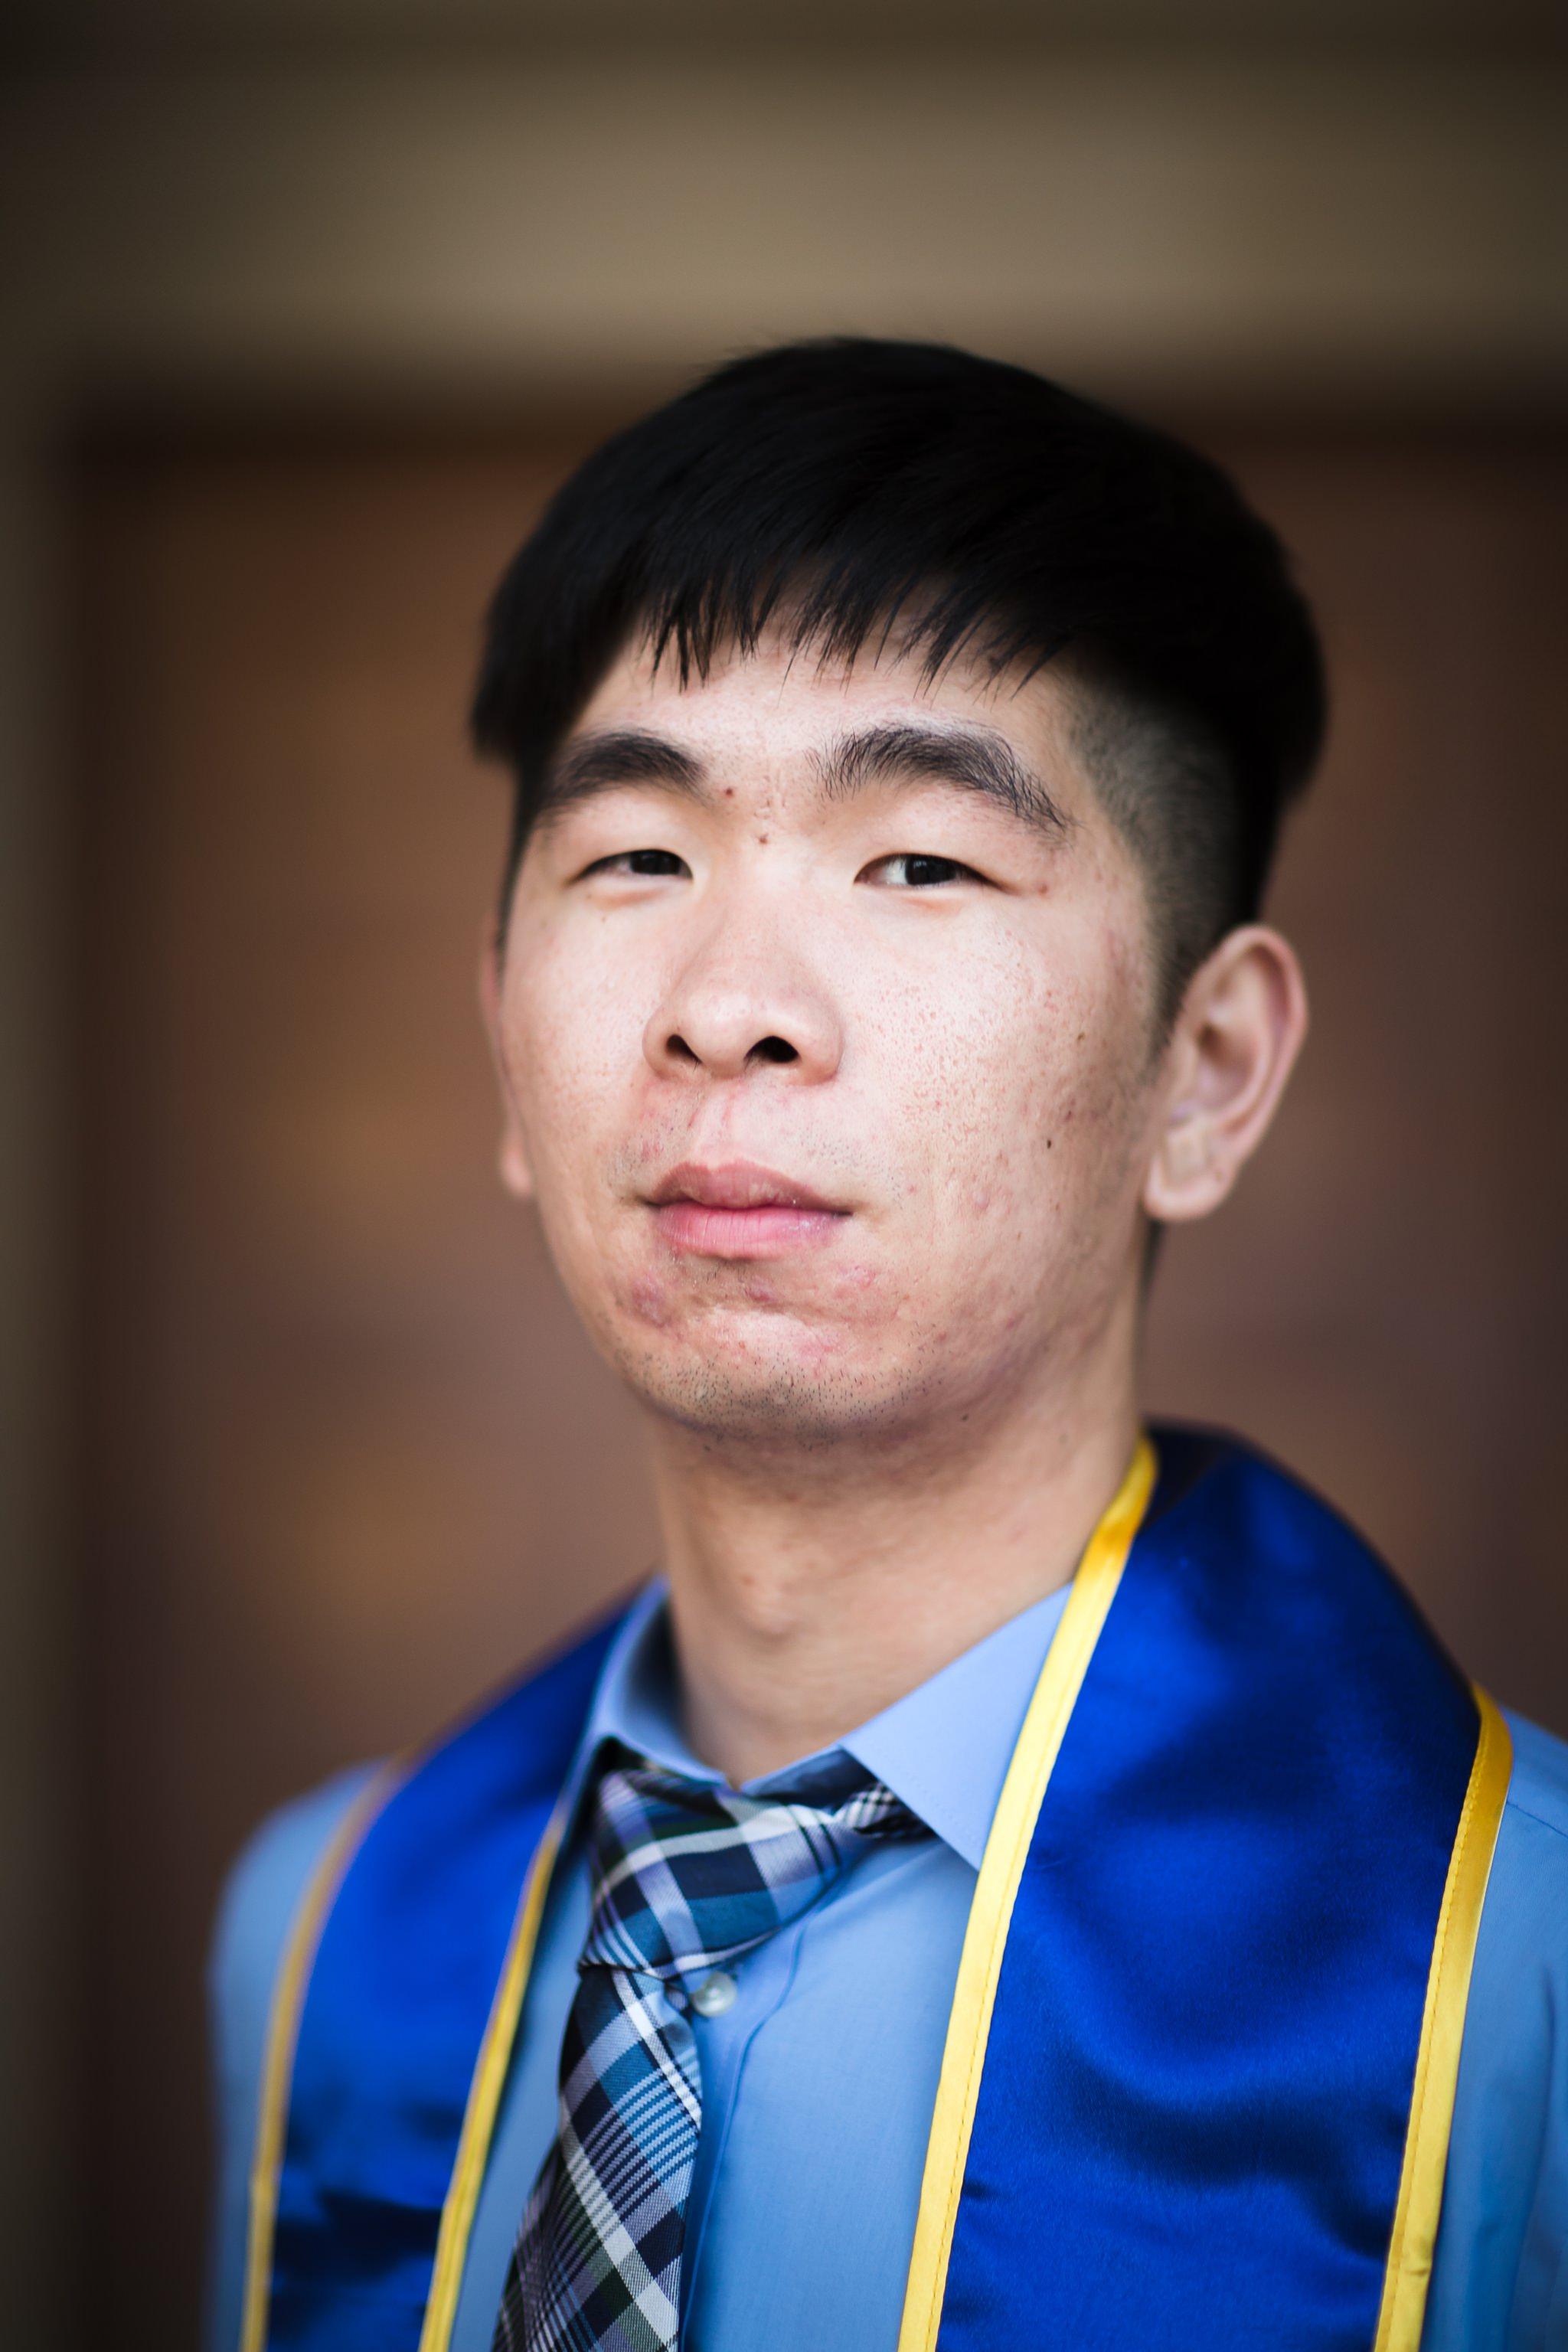 los-angeles-ucla-senior-graduation-portraits-royce-doors-headshot-with-sash